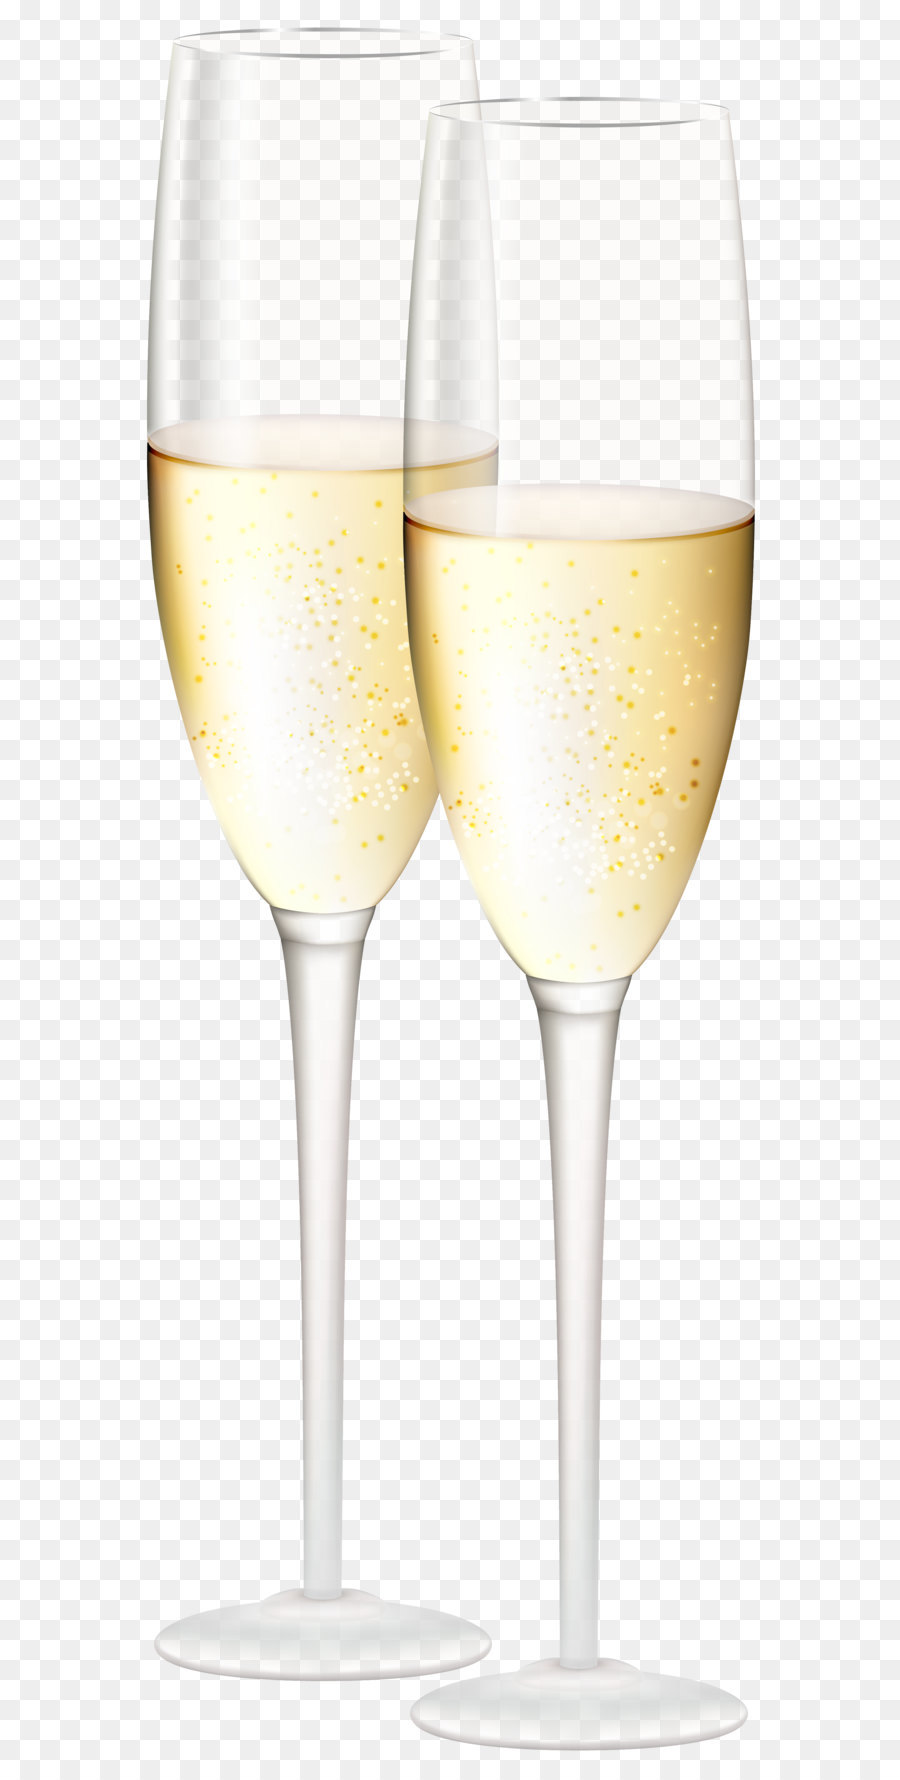 White wine glass glasses. Champagne clipart champagne cocktail